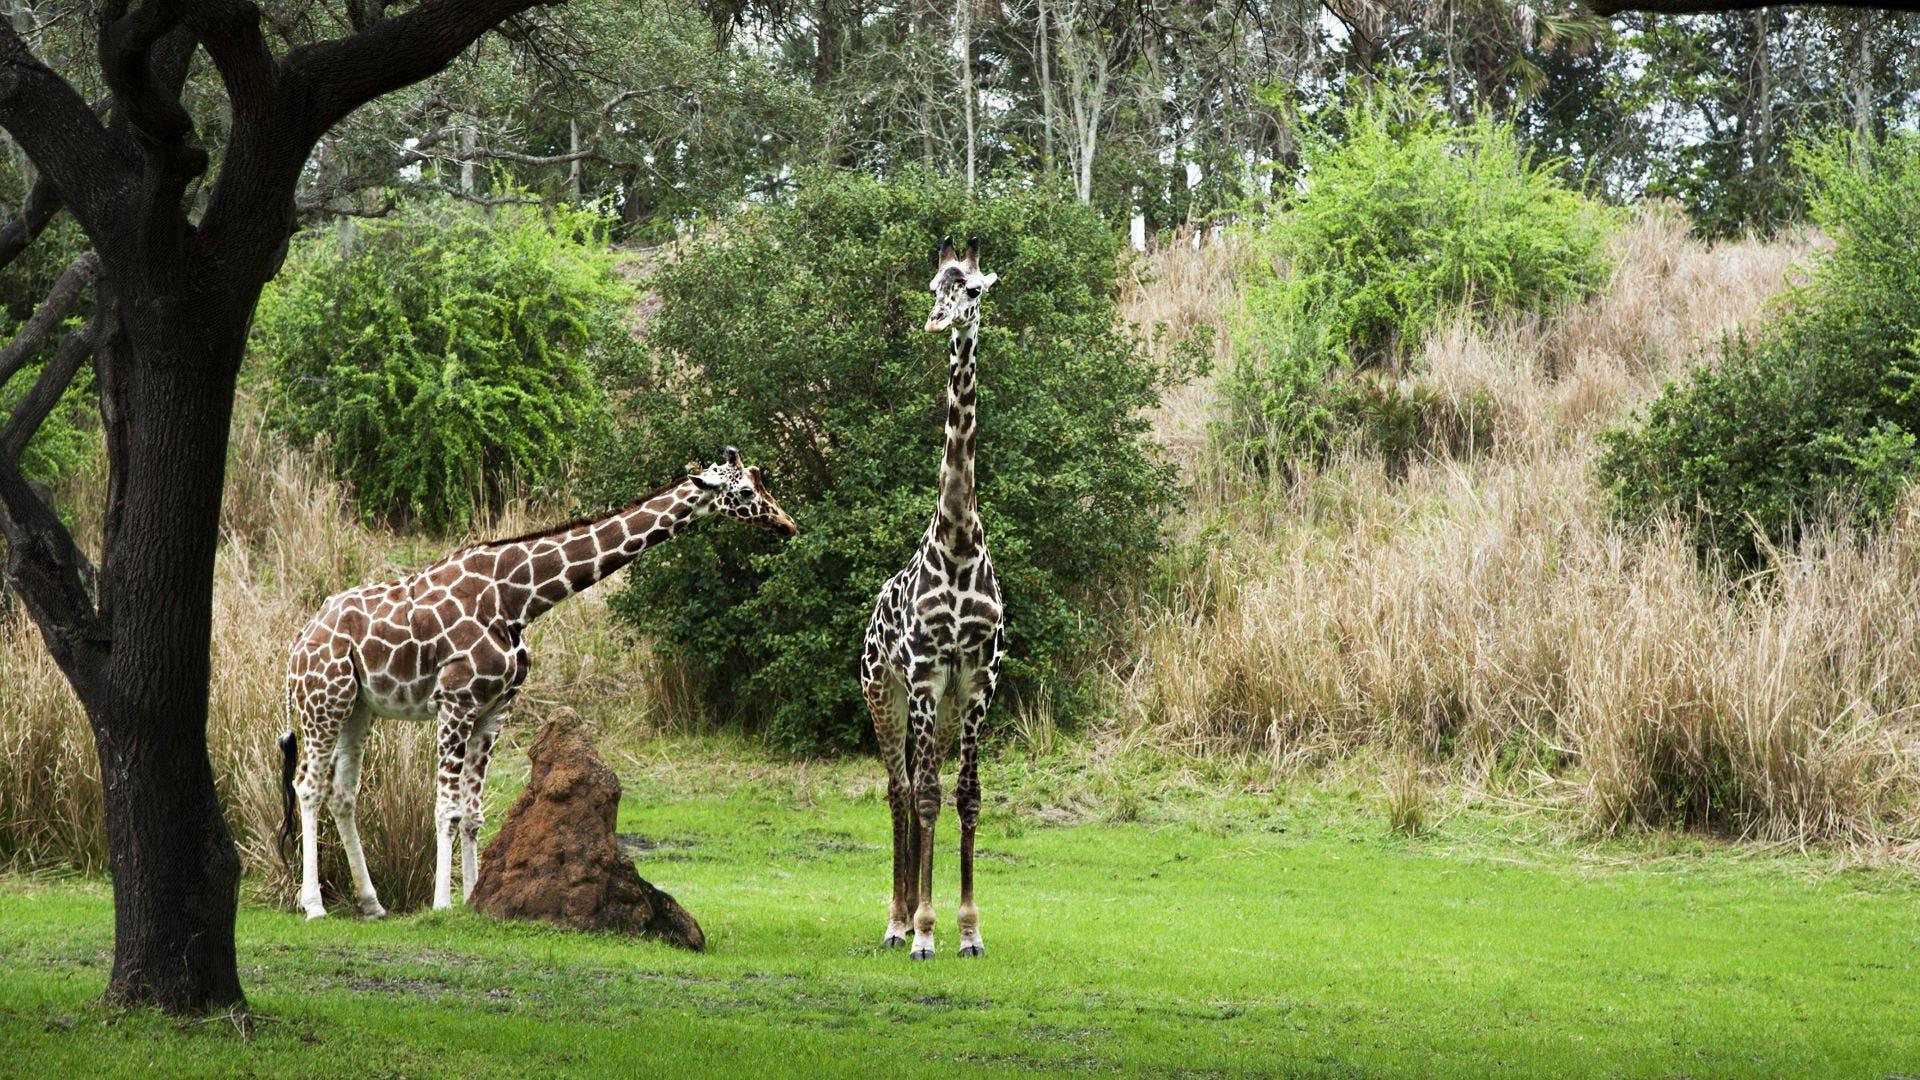 Two giraffes at Disney World's Animal Kingdom.